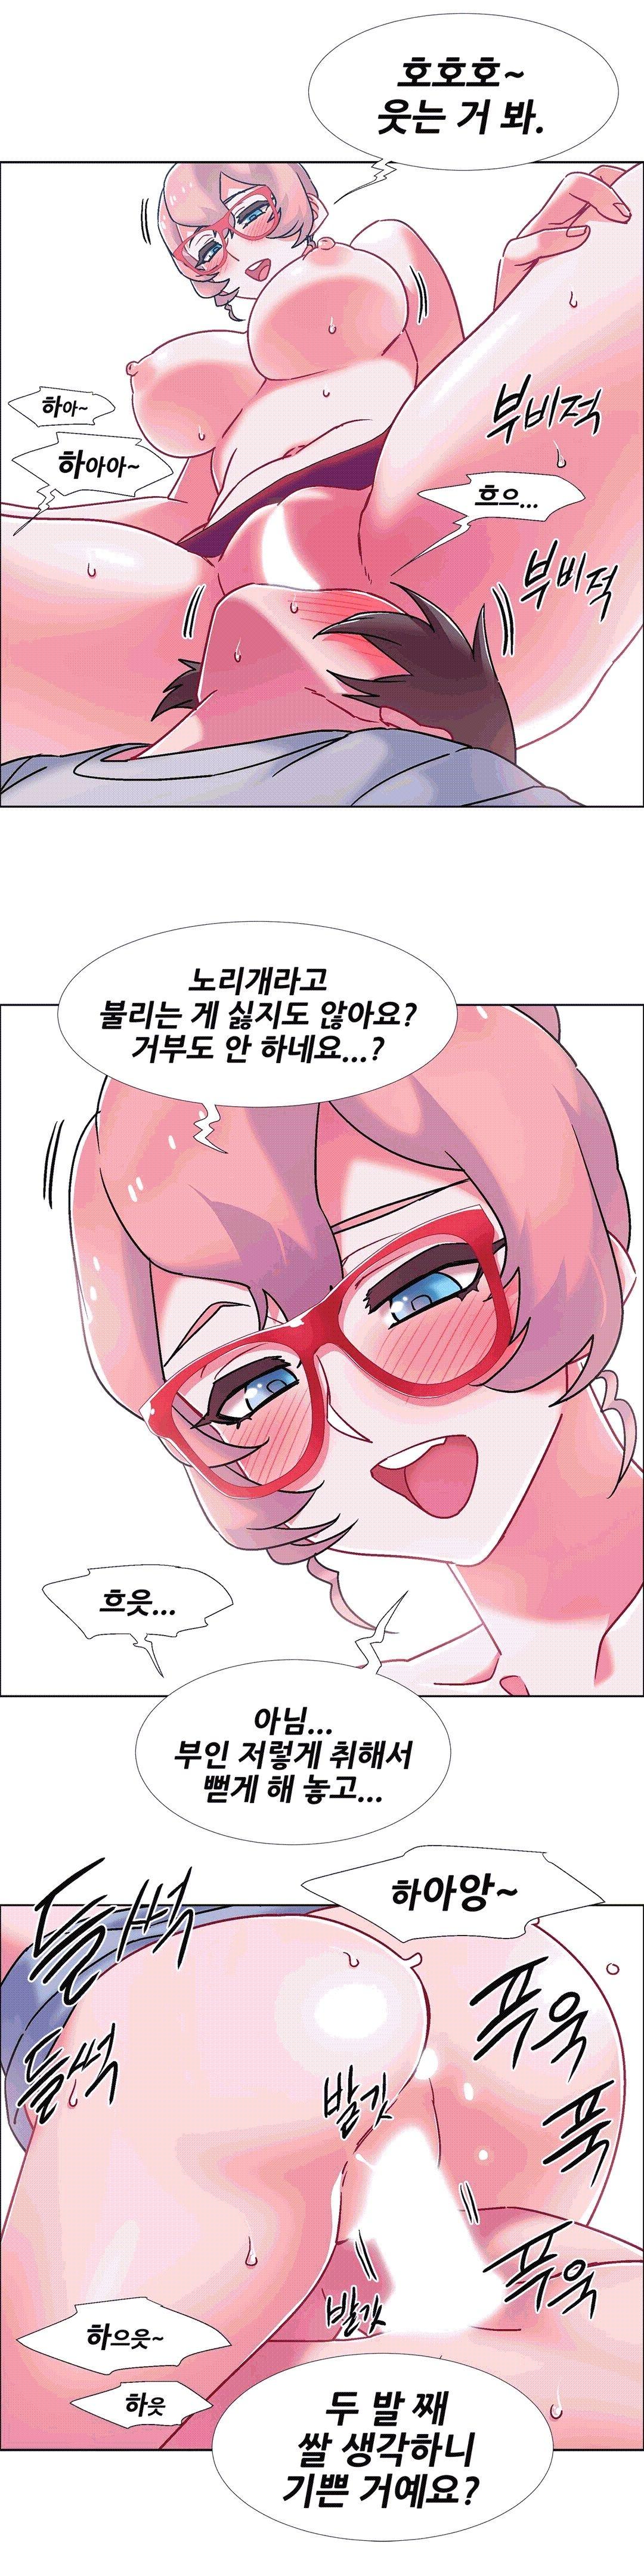 [Studio Wannabe] Rental Girls | 出租女郎 Ch. 33-58 [Chinese]  第二季 完结 623